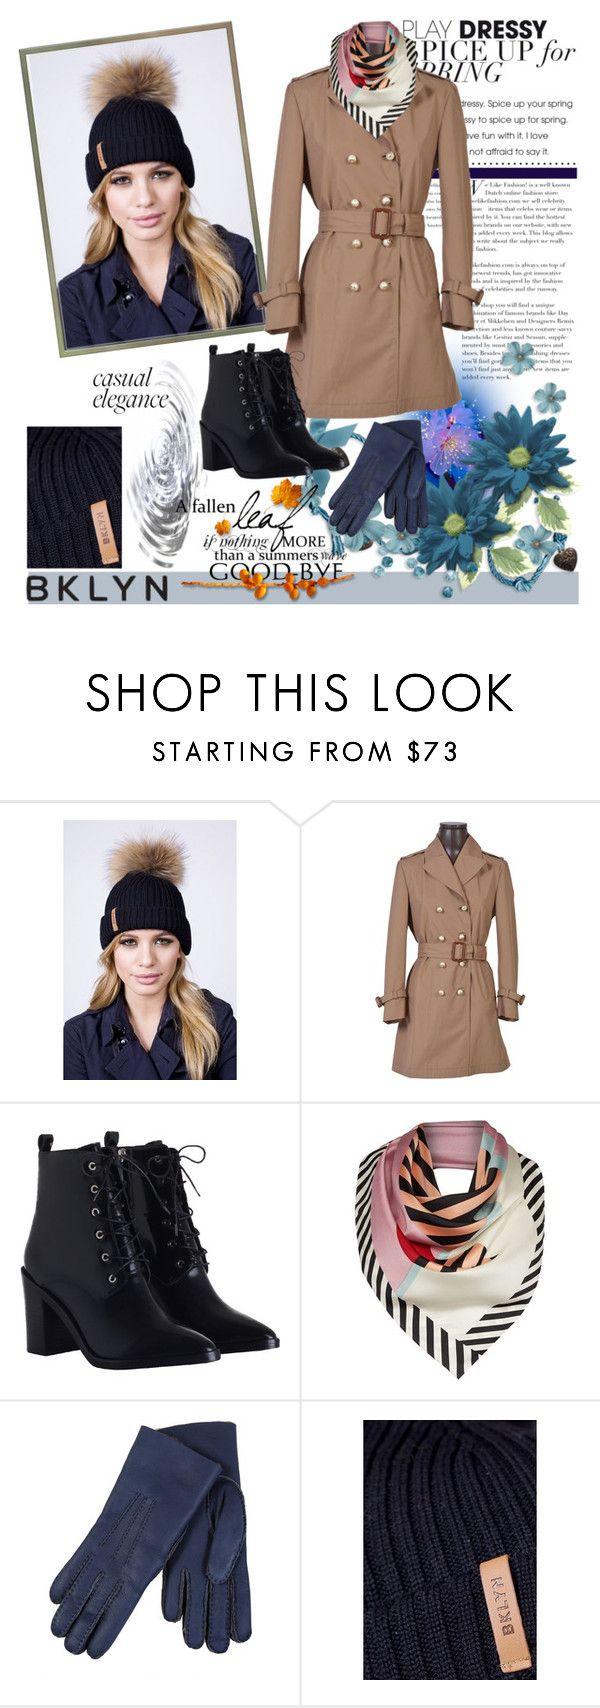 """BKLYN Black Bobble Hat"" by irinavsl ❤ liked on Polyvore featuring Gucci, Zimmermann, Lulu Guinness, Restelli and bklyn"